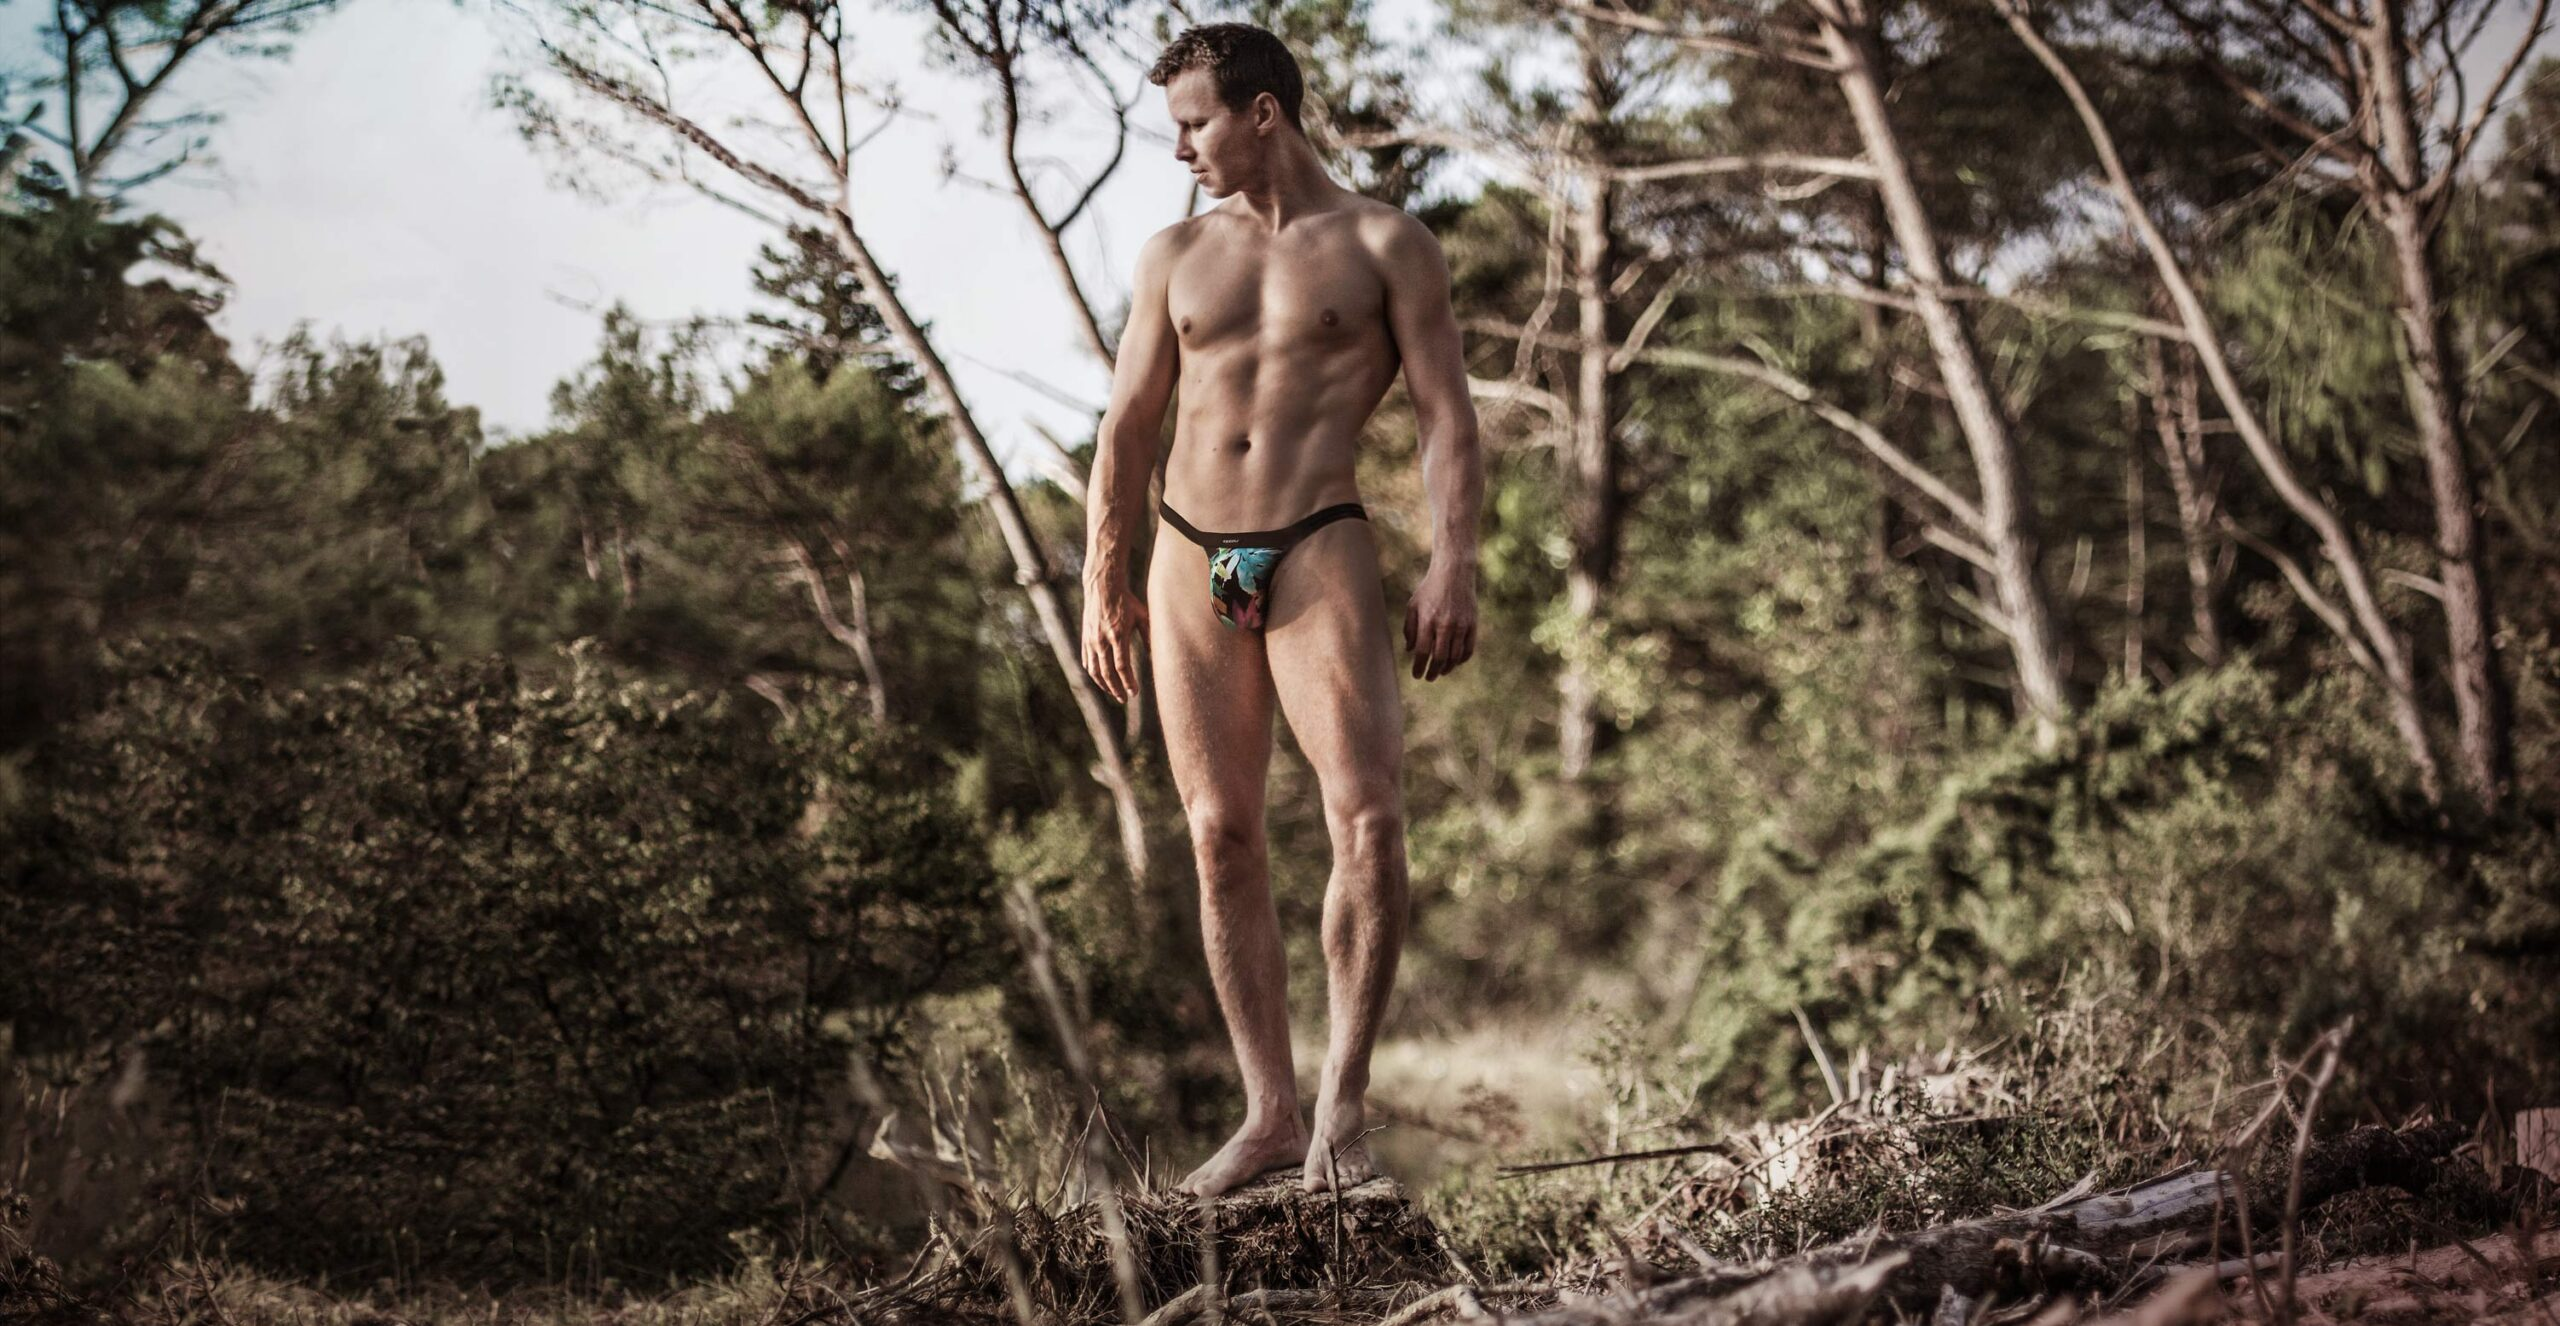 Fetisch Fotografin Panties Man Photos